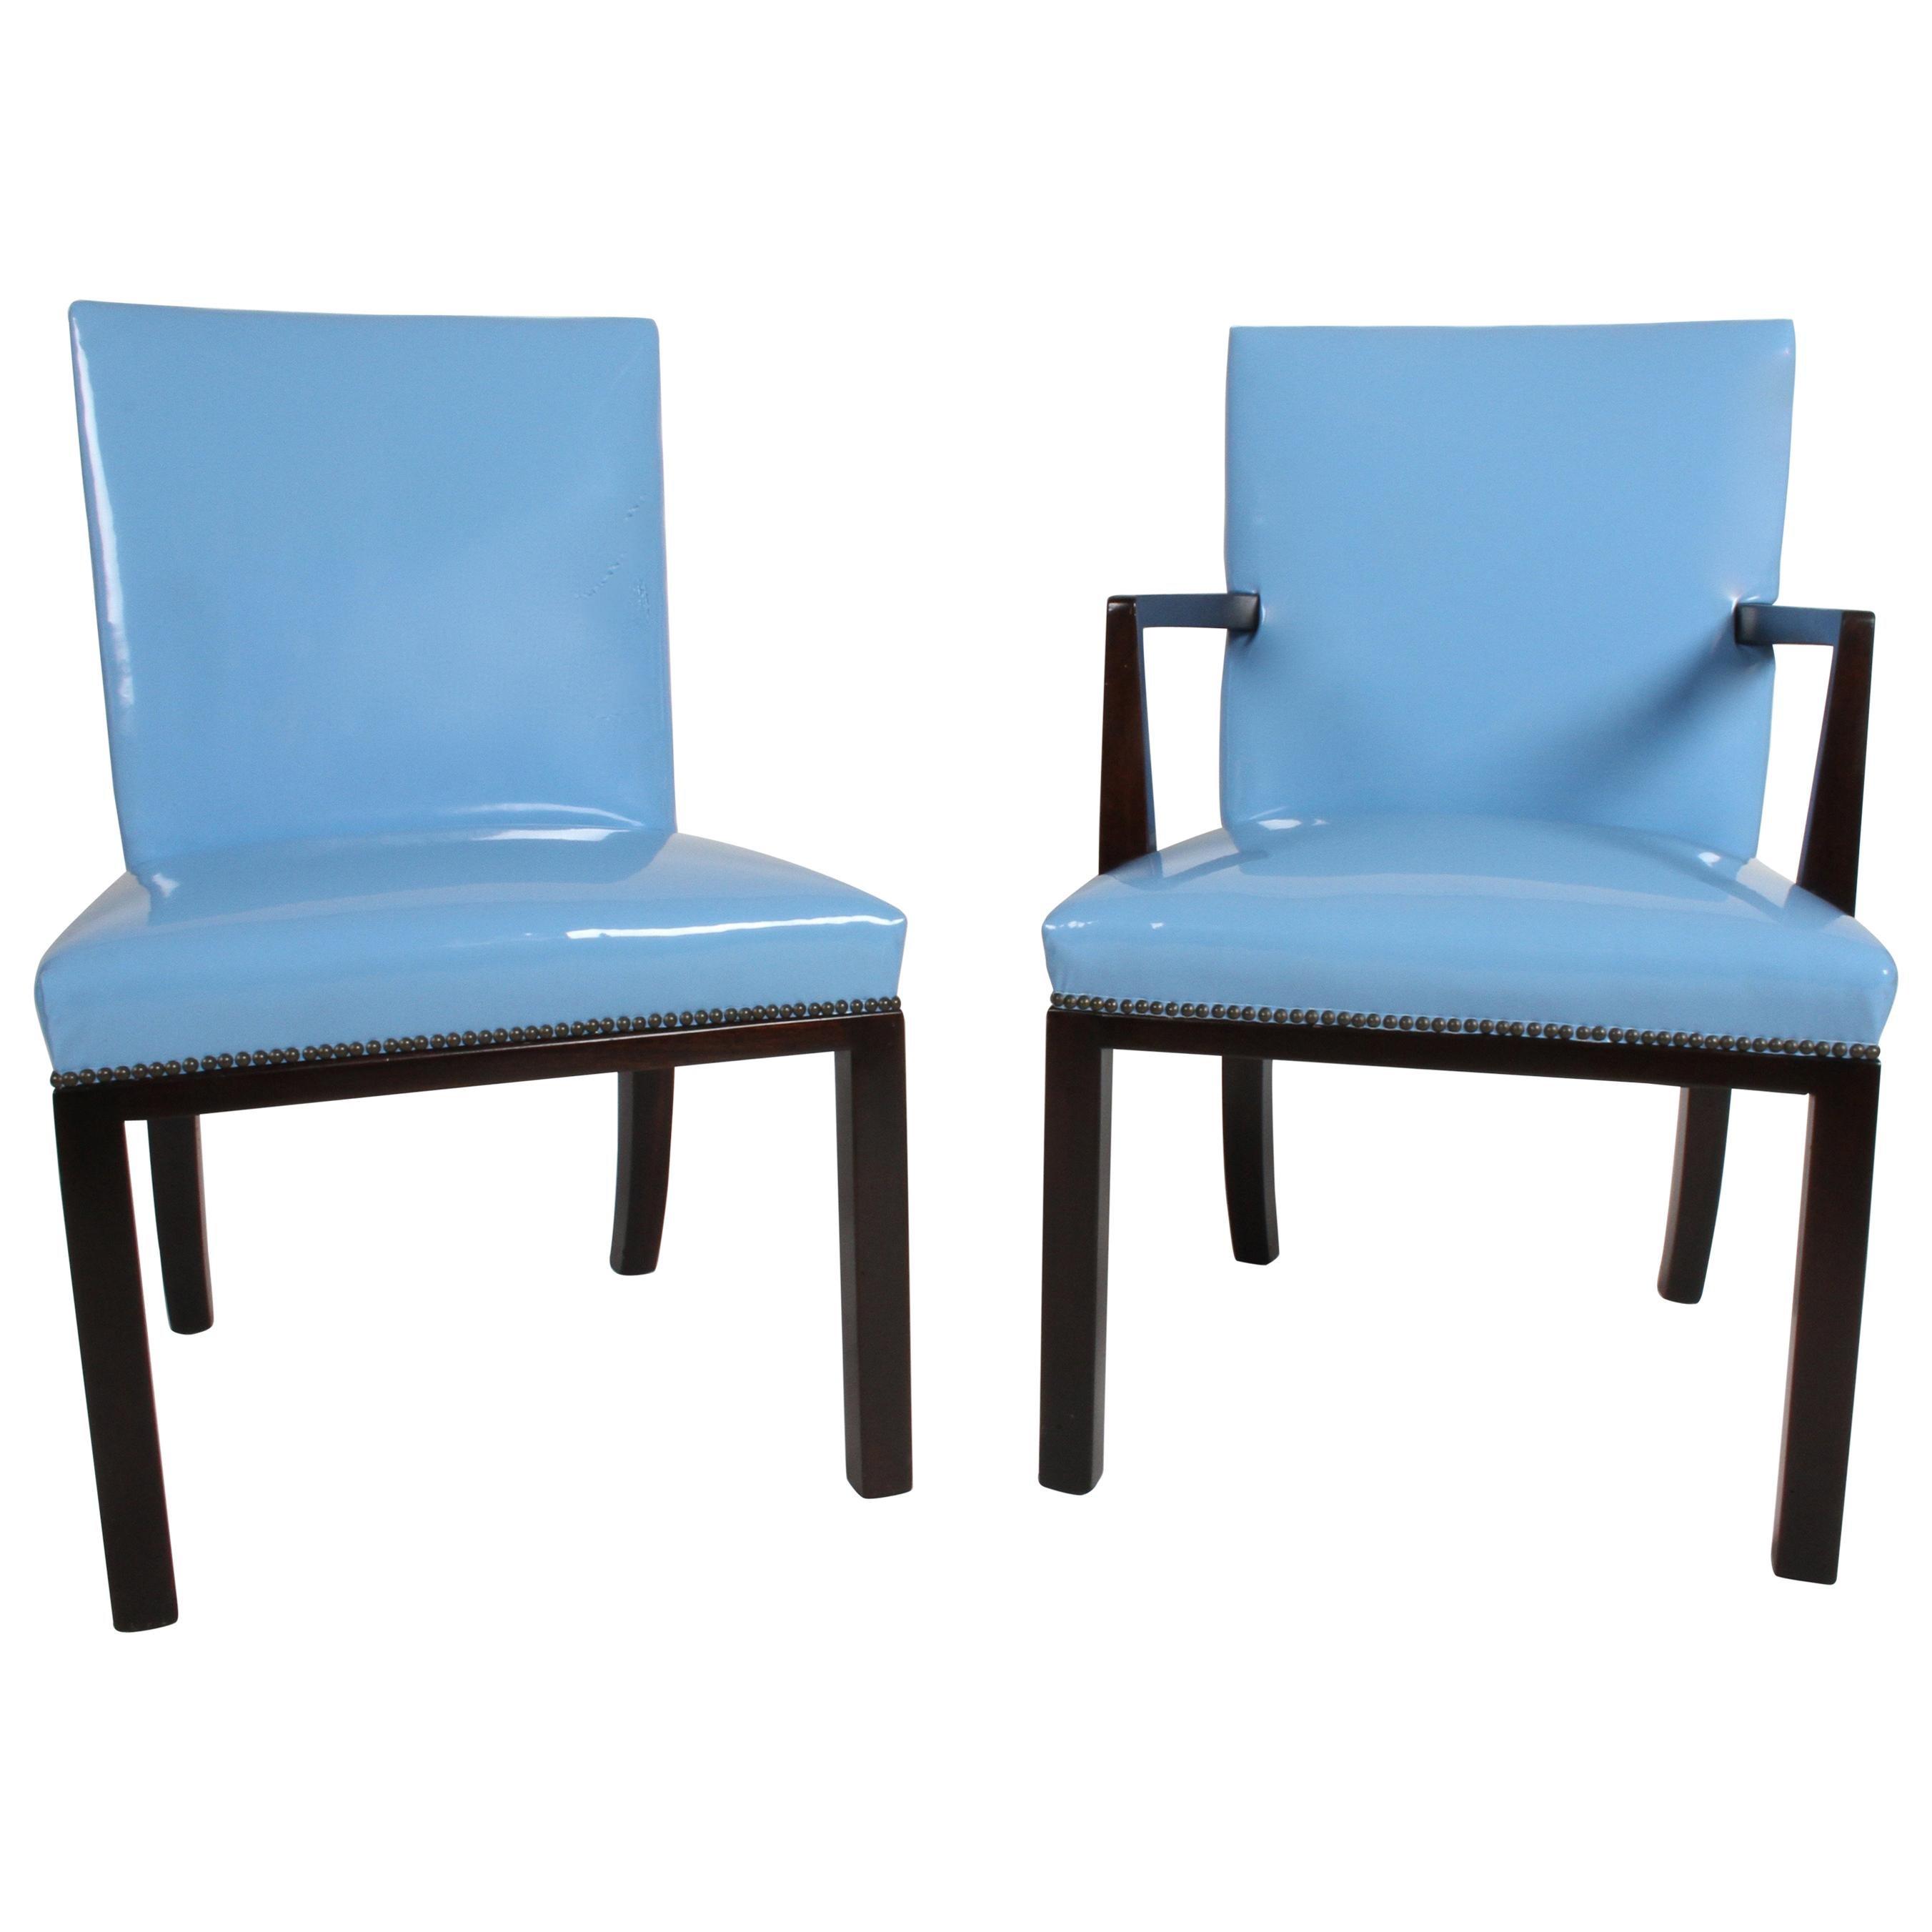 Set of Eight Edward J. Wormley for Dunbar Dining Chairs, circa 1950